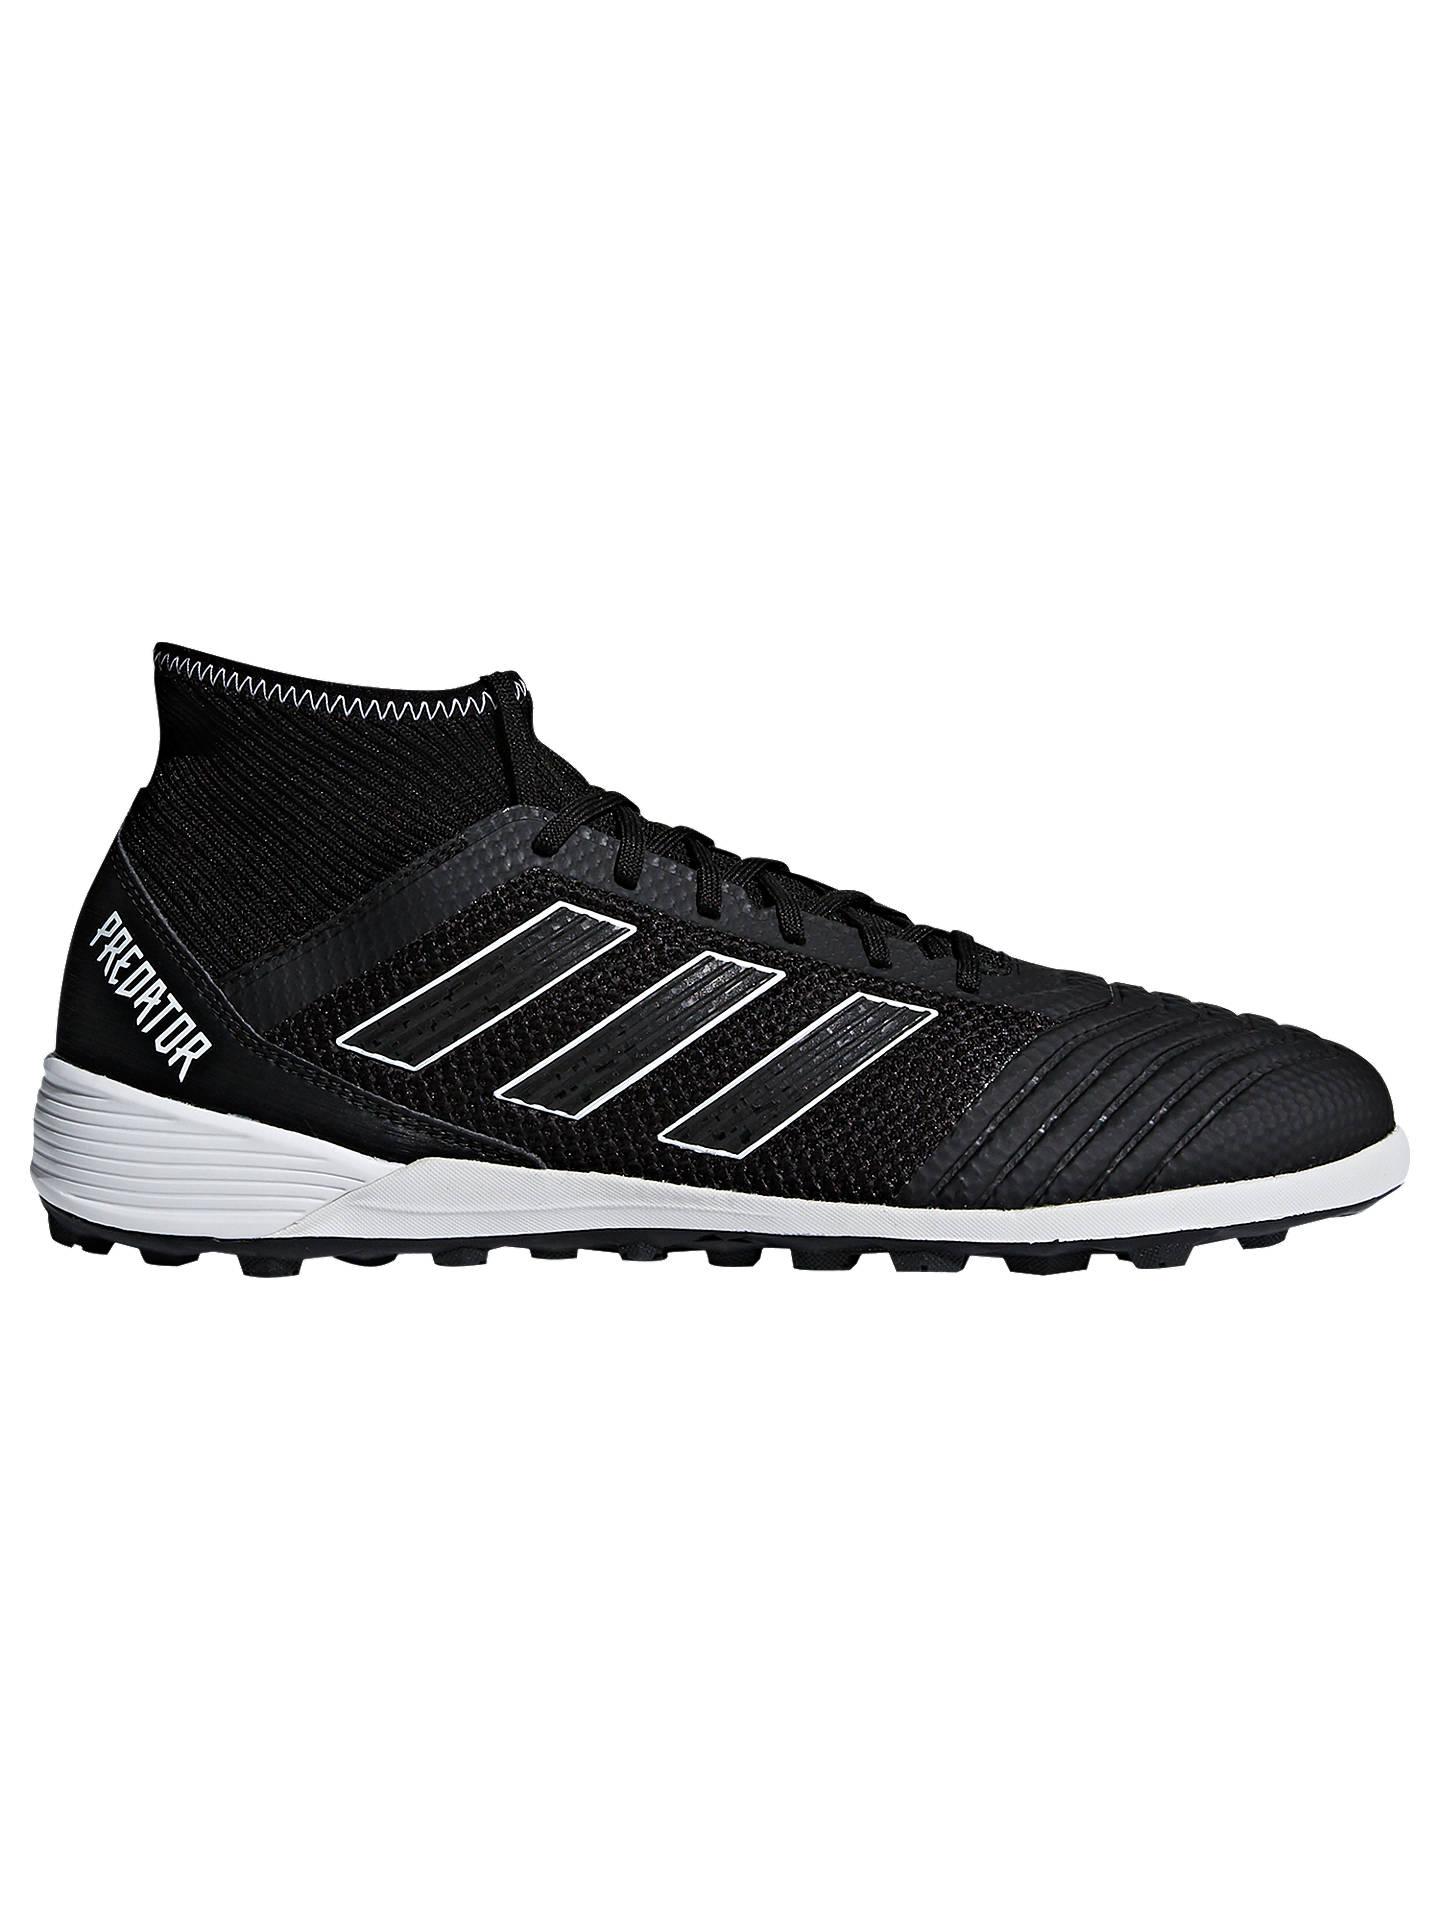 5dcfef494 Buy adidas Predator Tango 18.4 Men's Artificial Turf Football Shoes, Core  Black, 7 Online ...